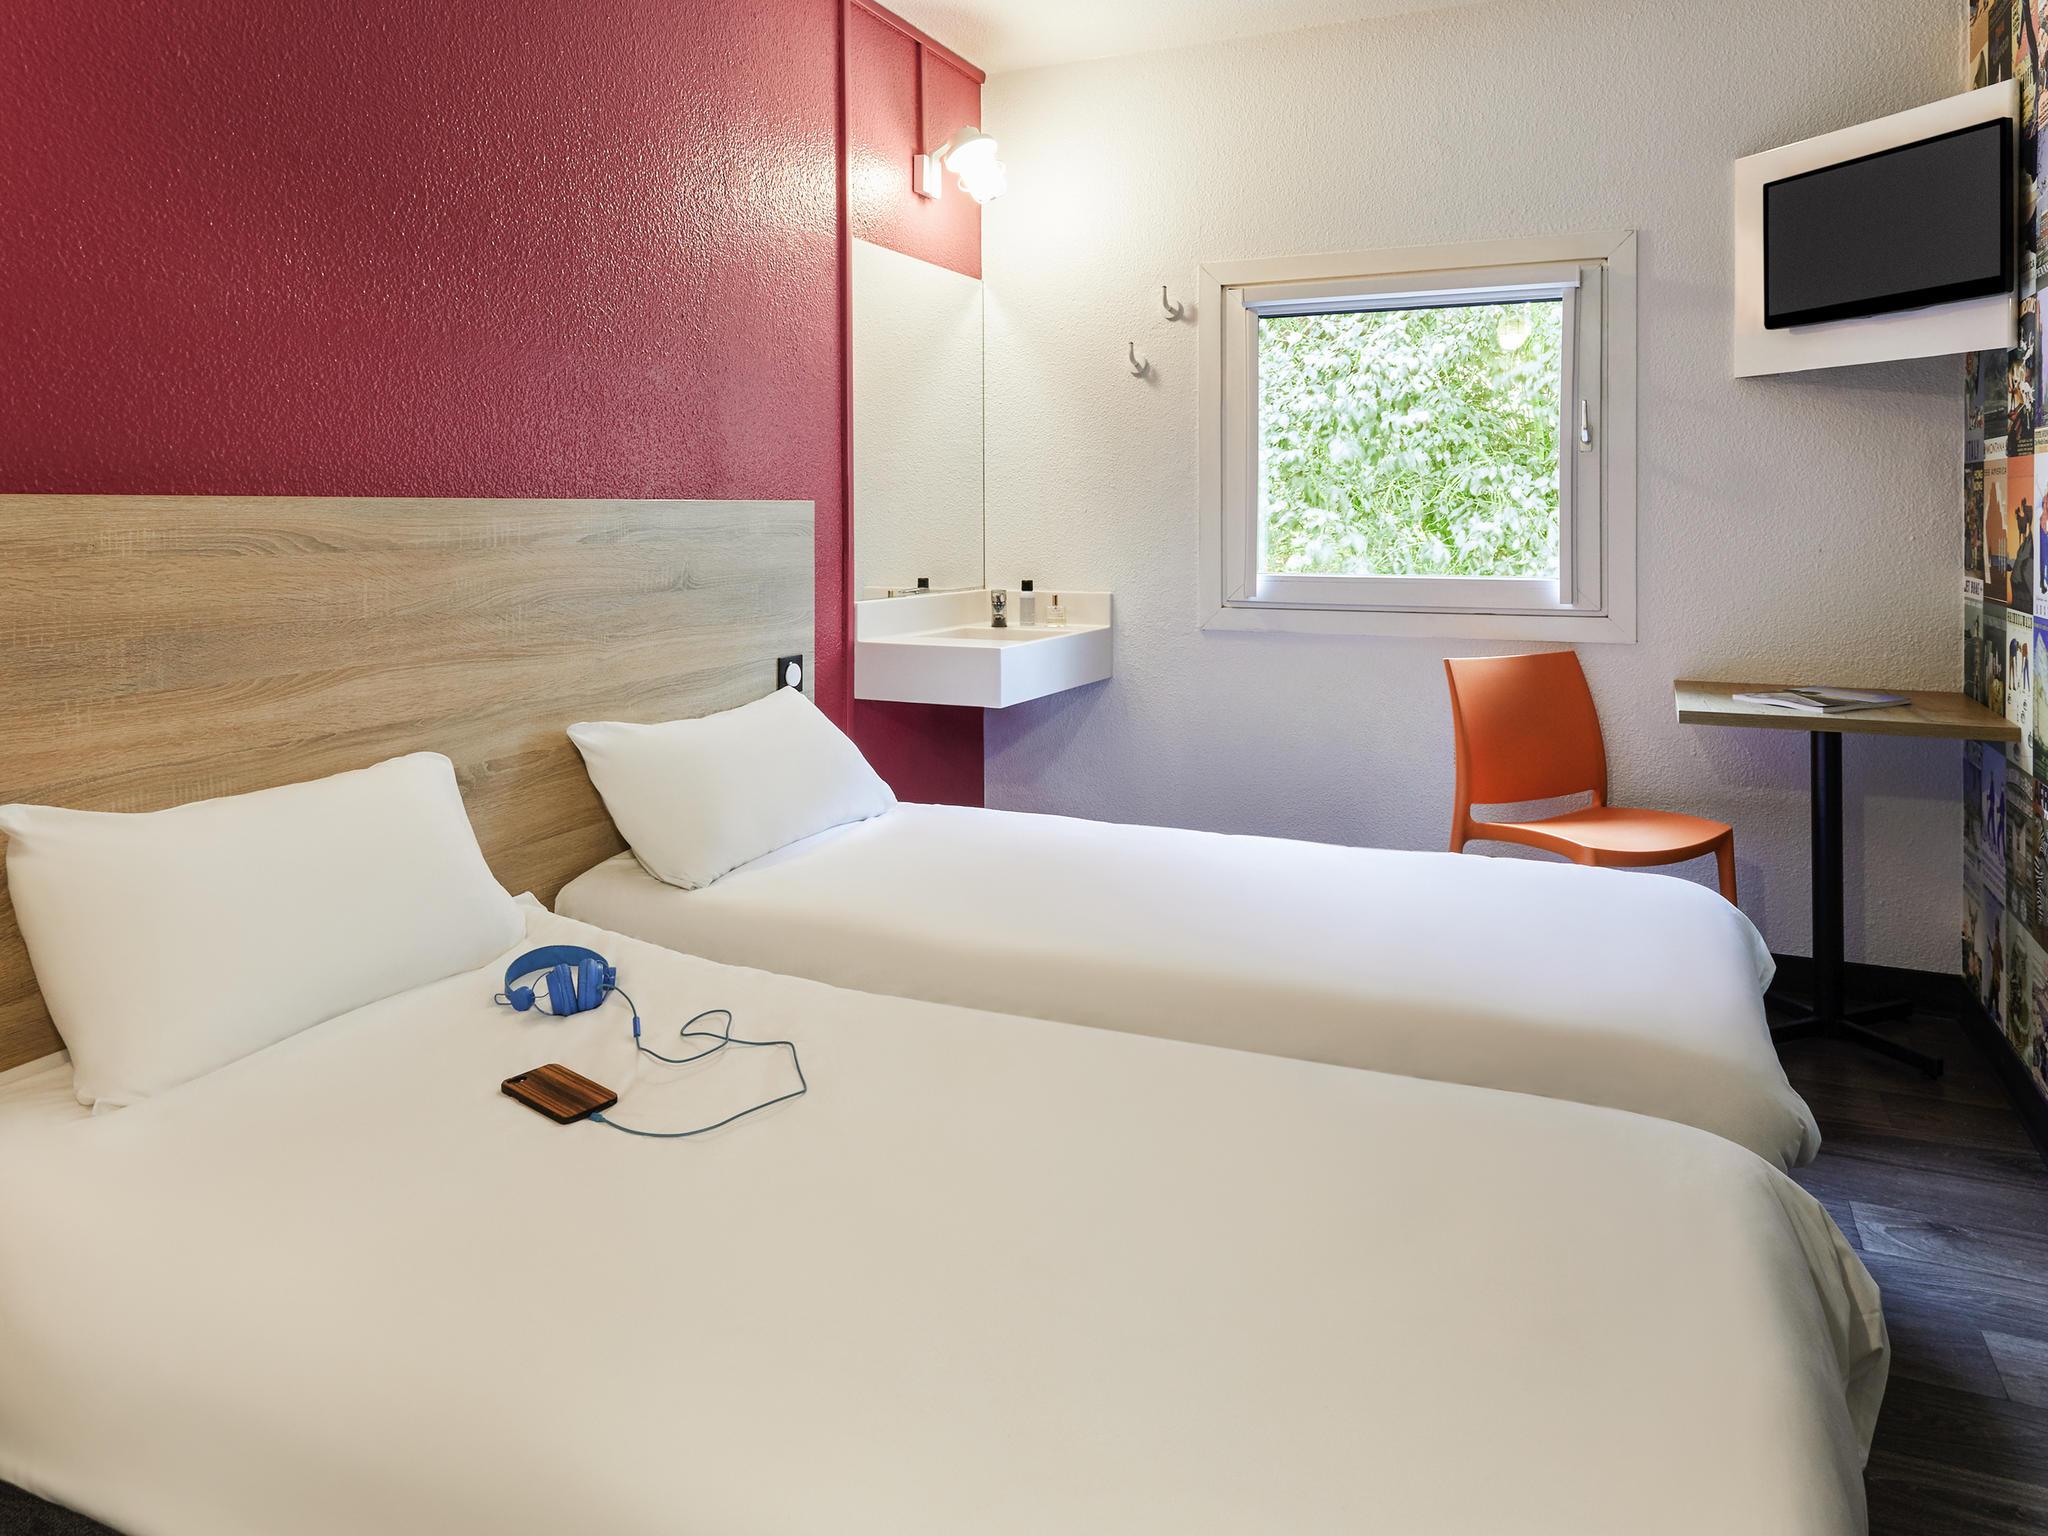 Hotel - hotelF1 Rungis Orly